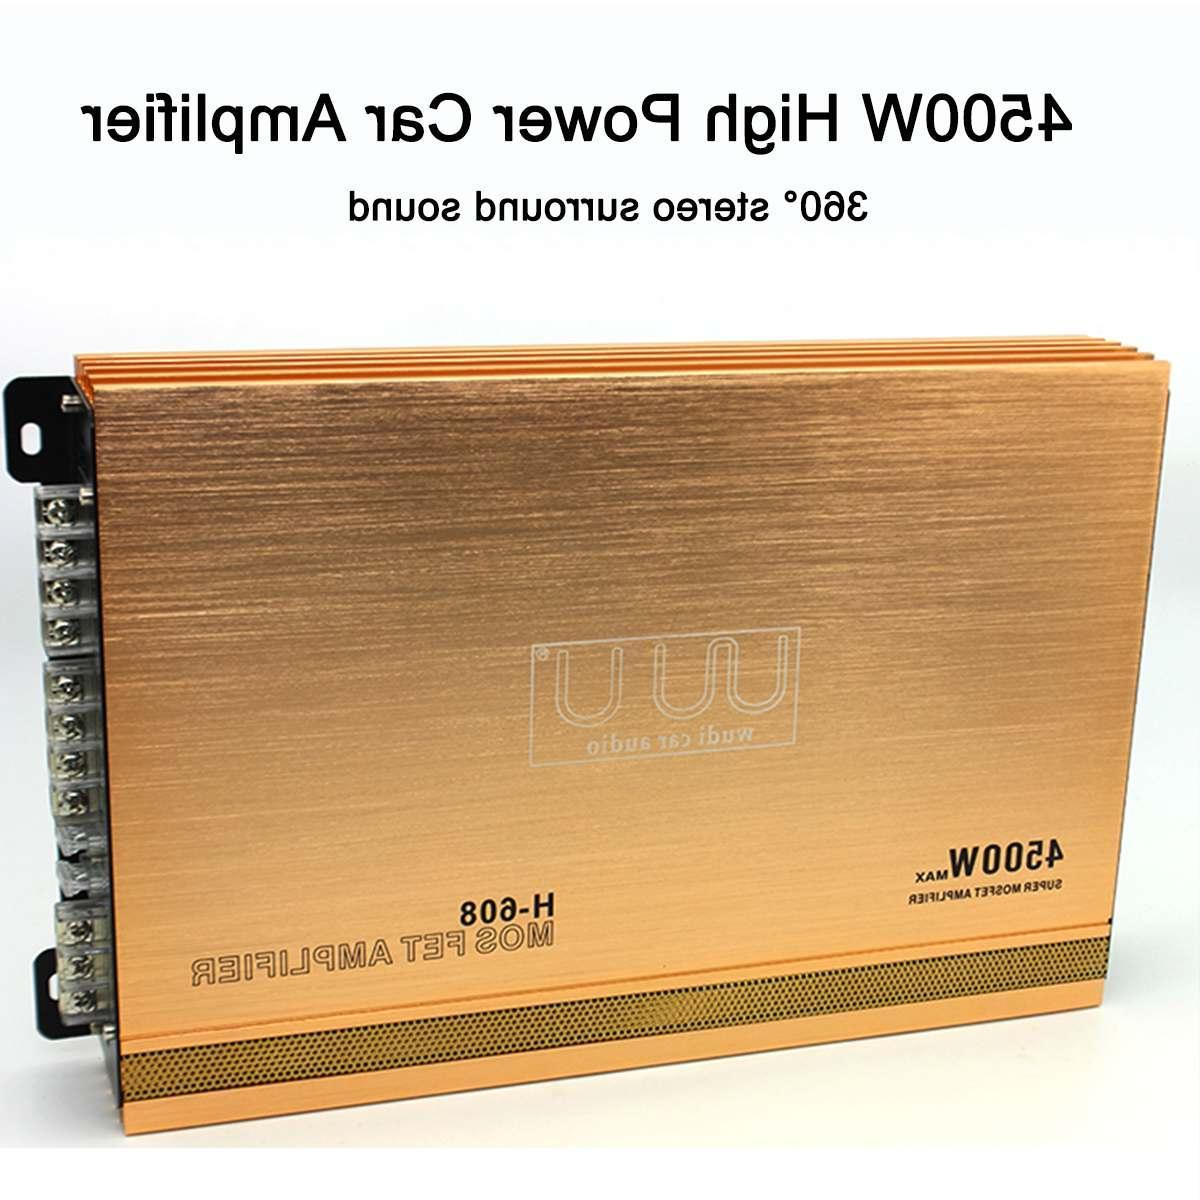 4 Channel High Power <font><b>Amplifier</b></font> Stereo <font><b>Surround</b></font> Audio <font><b>Amplifiers</b></font>